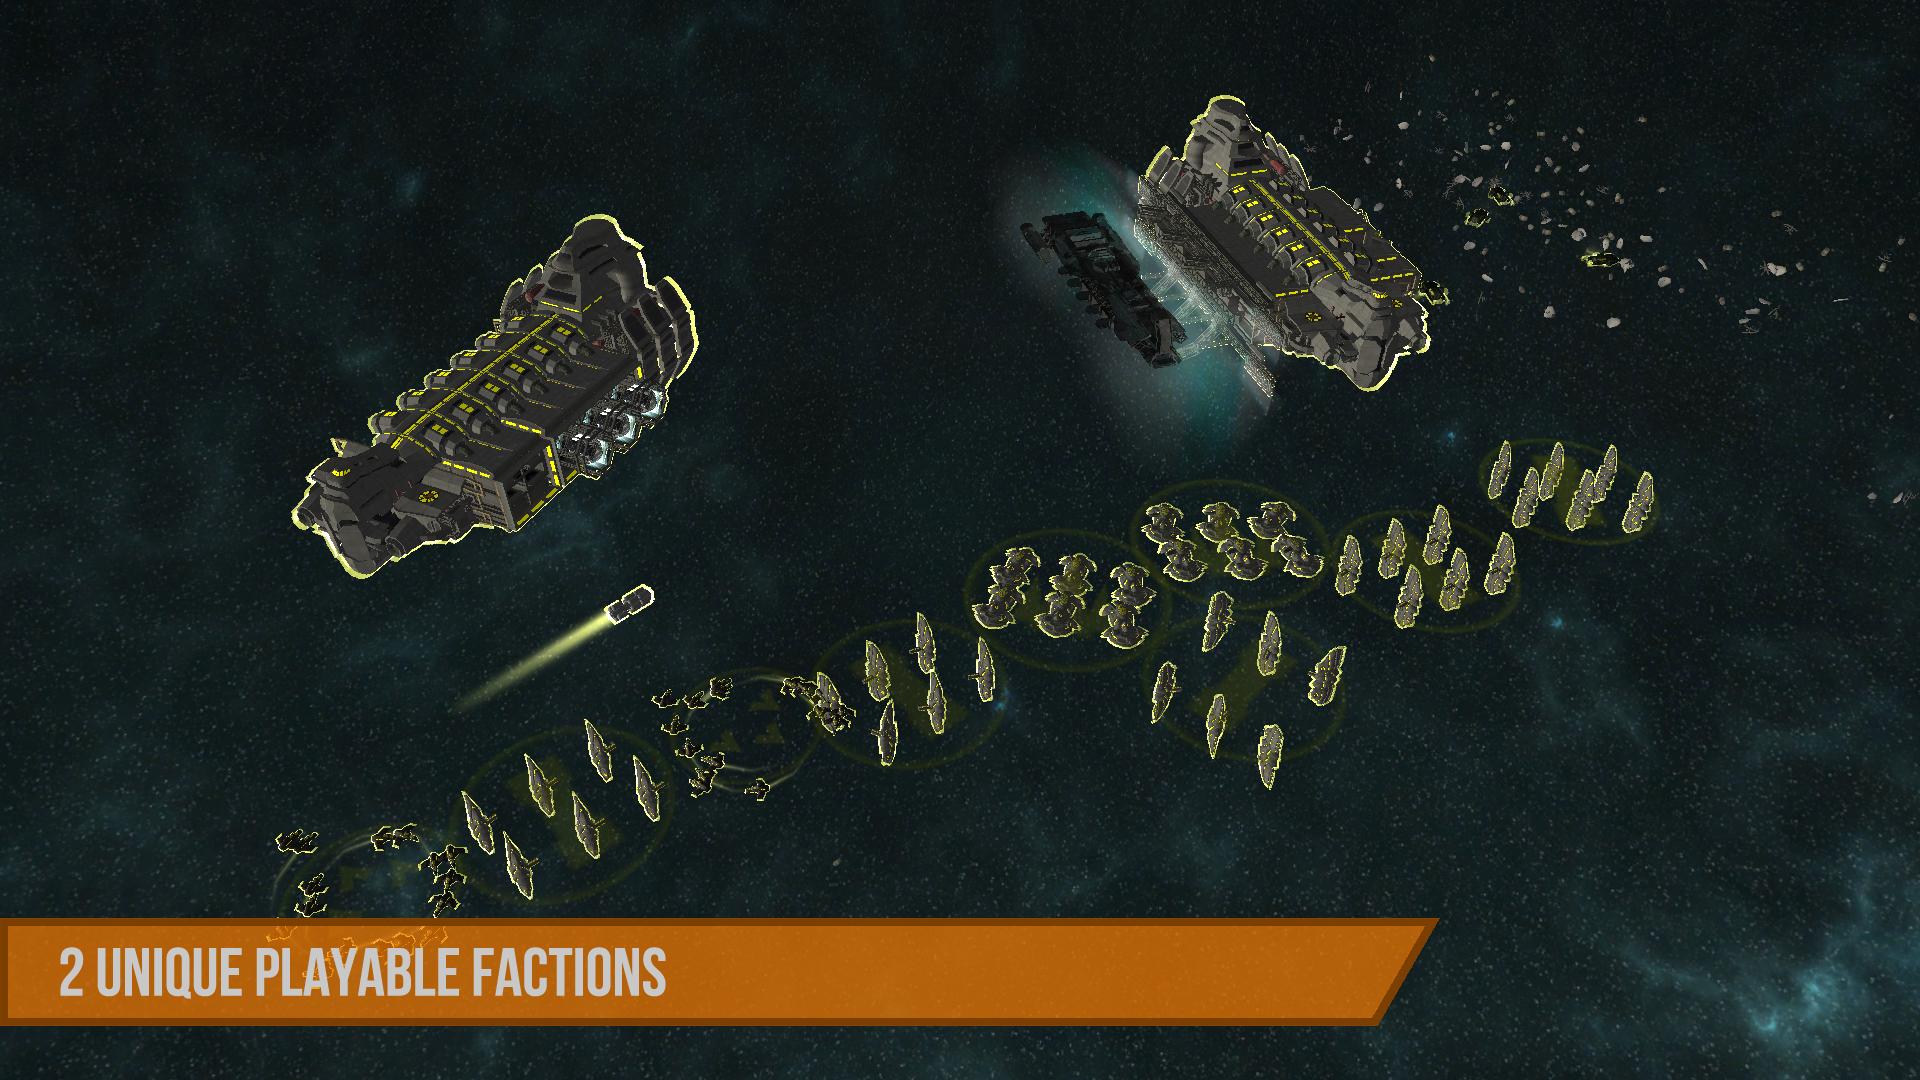 FactionsC.jpg